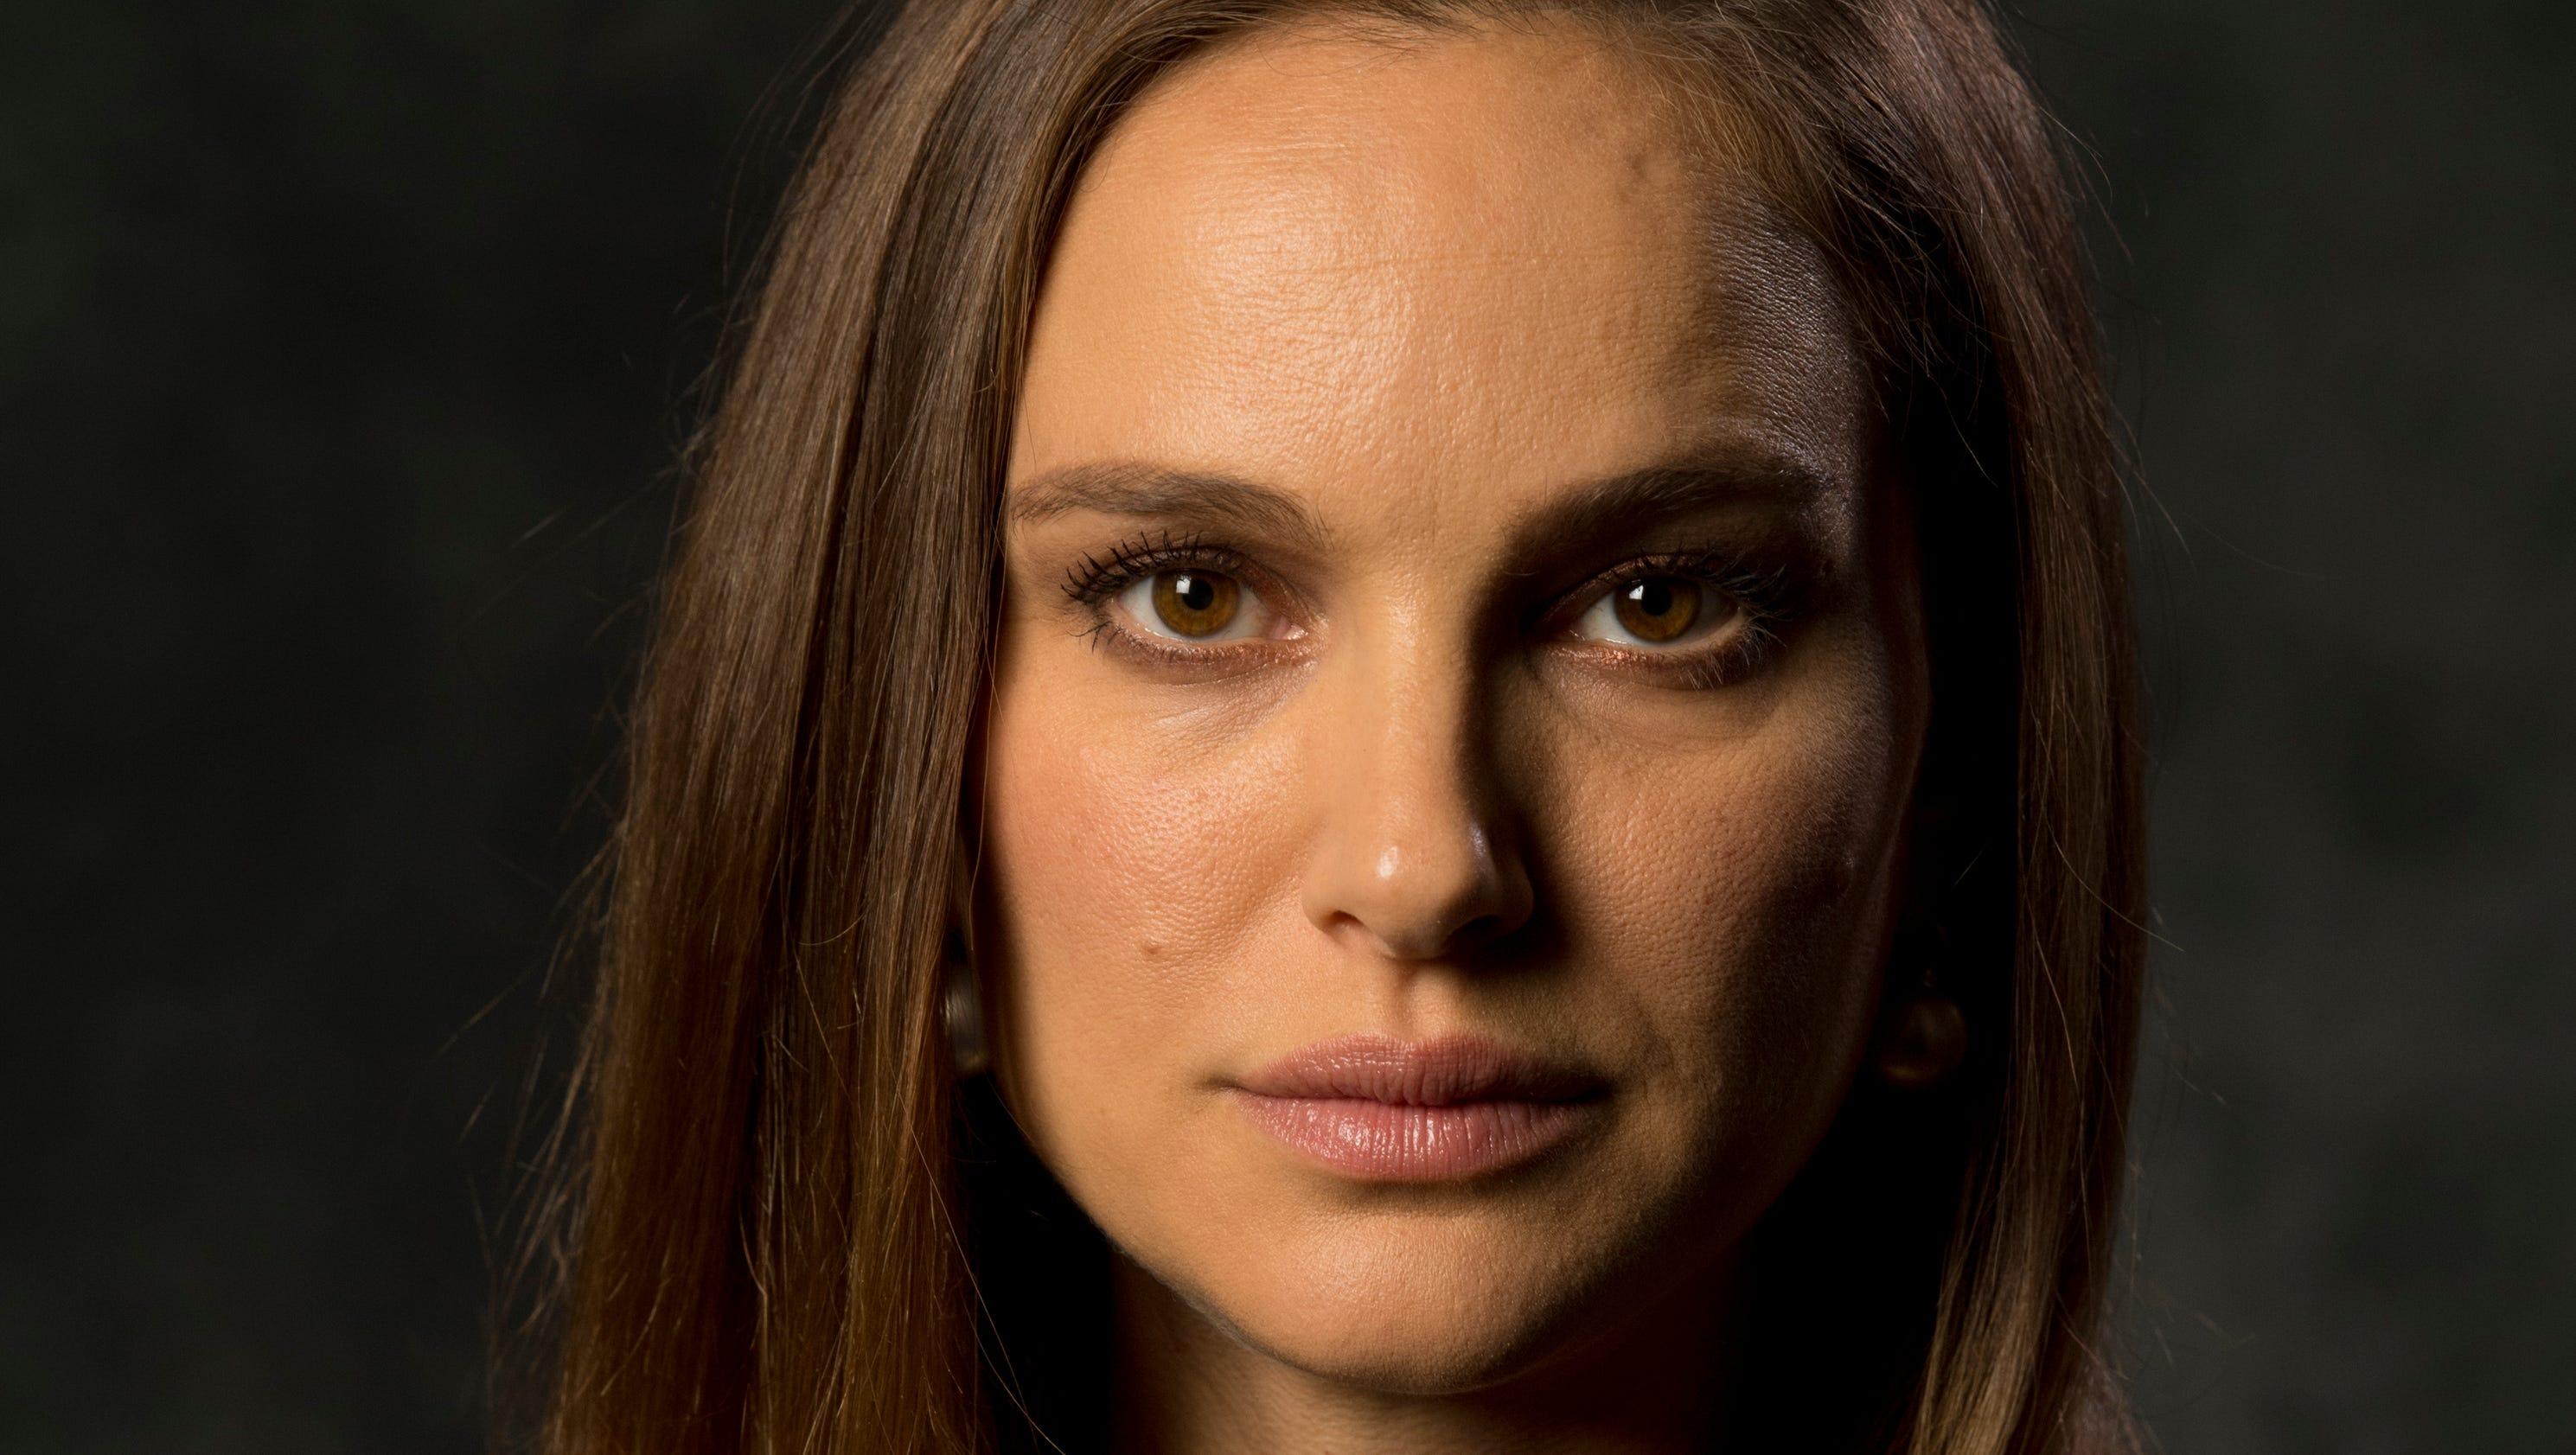 Natalie Portman uncovers 'mystery' of 'Jackie' Natalie Portman Google